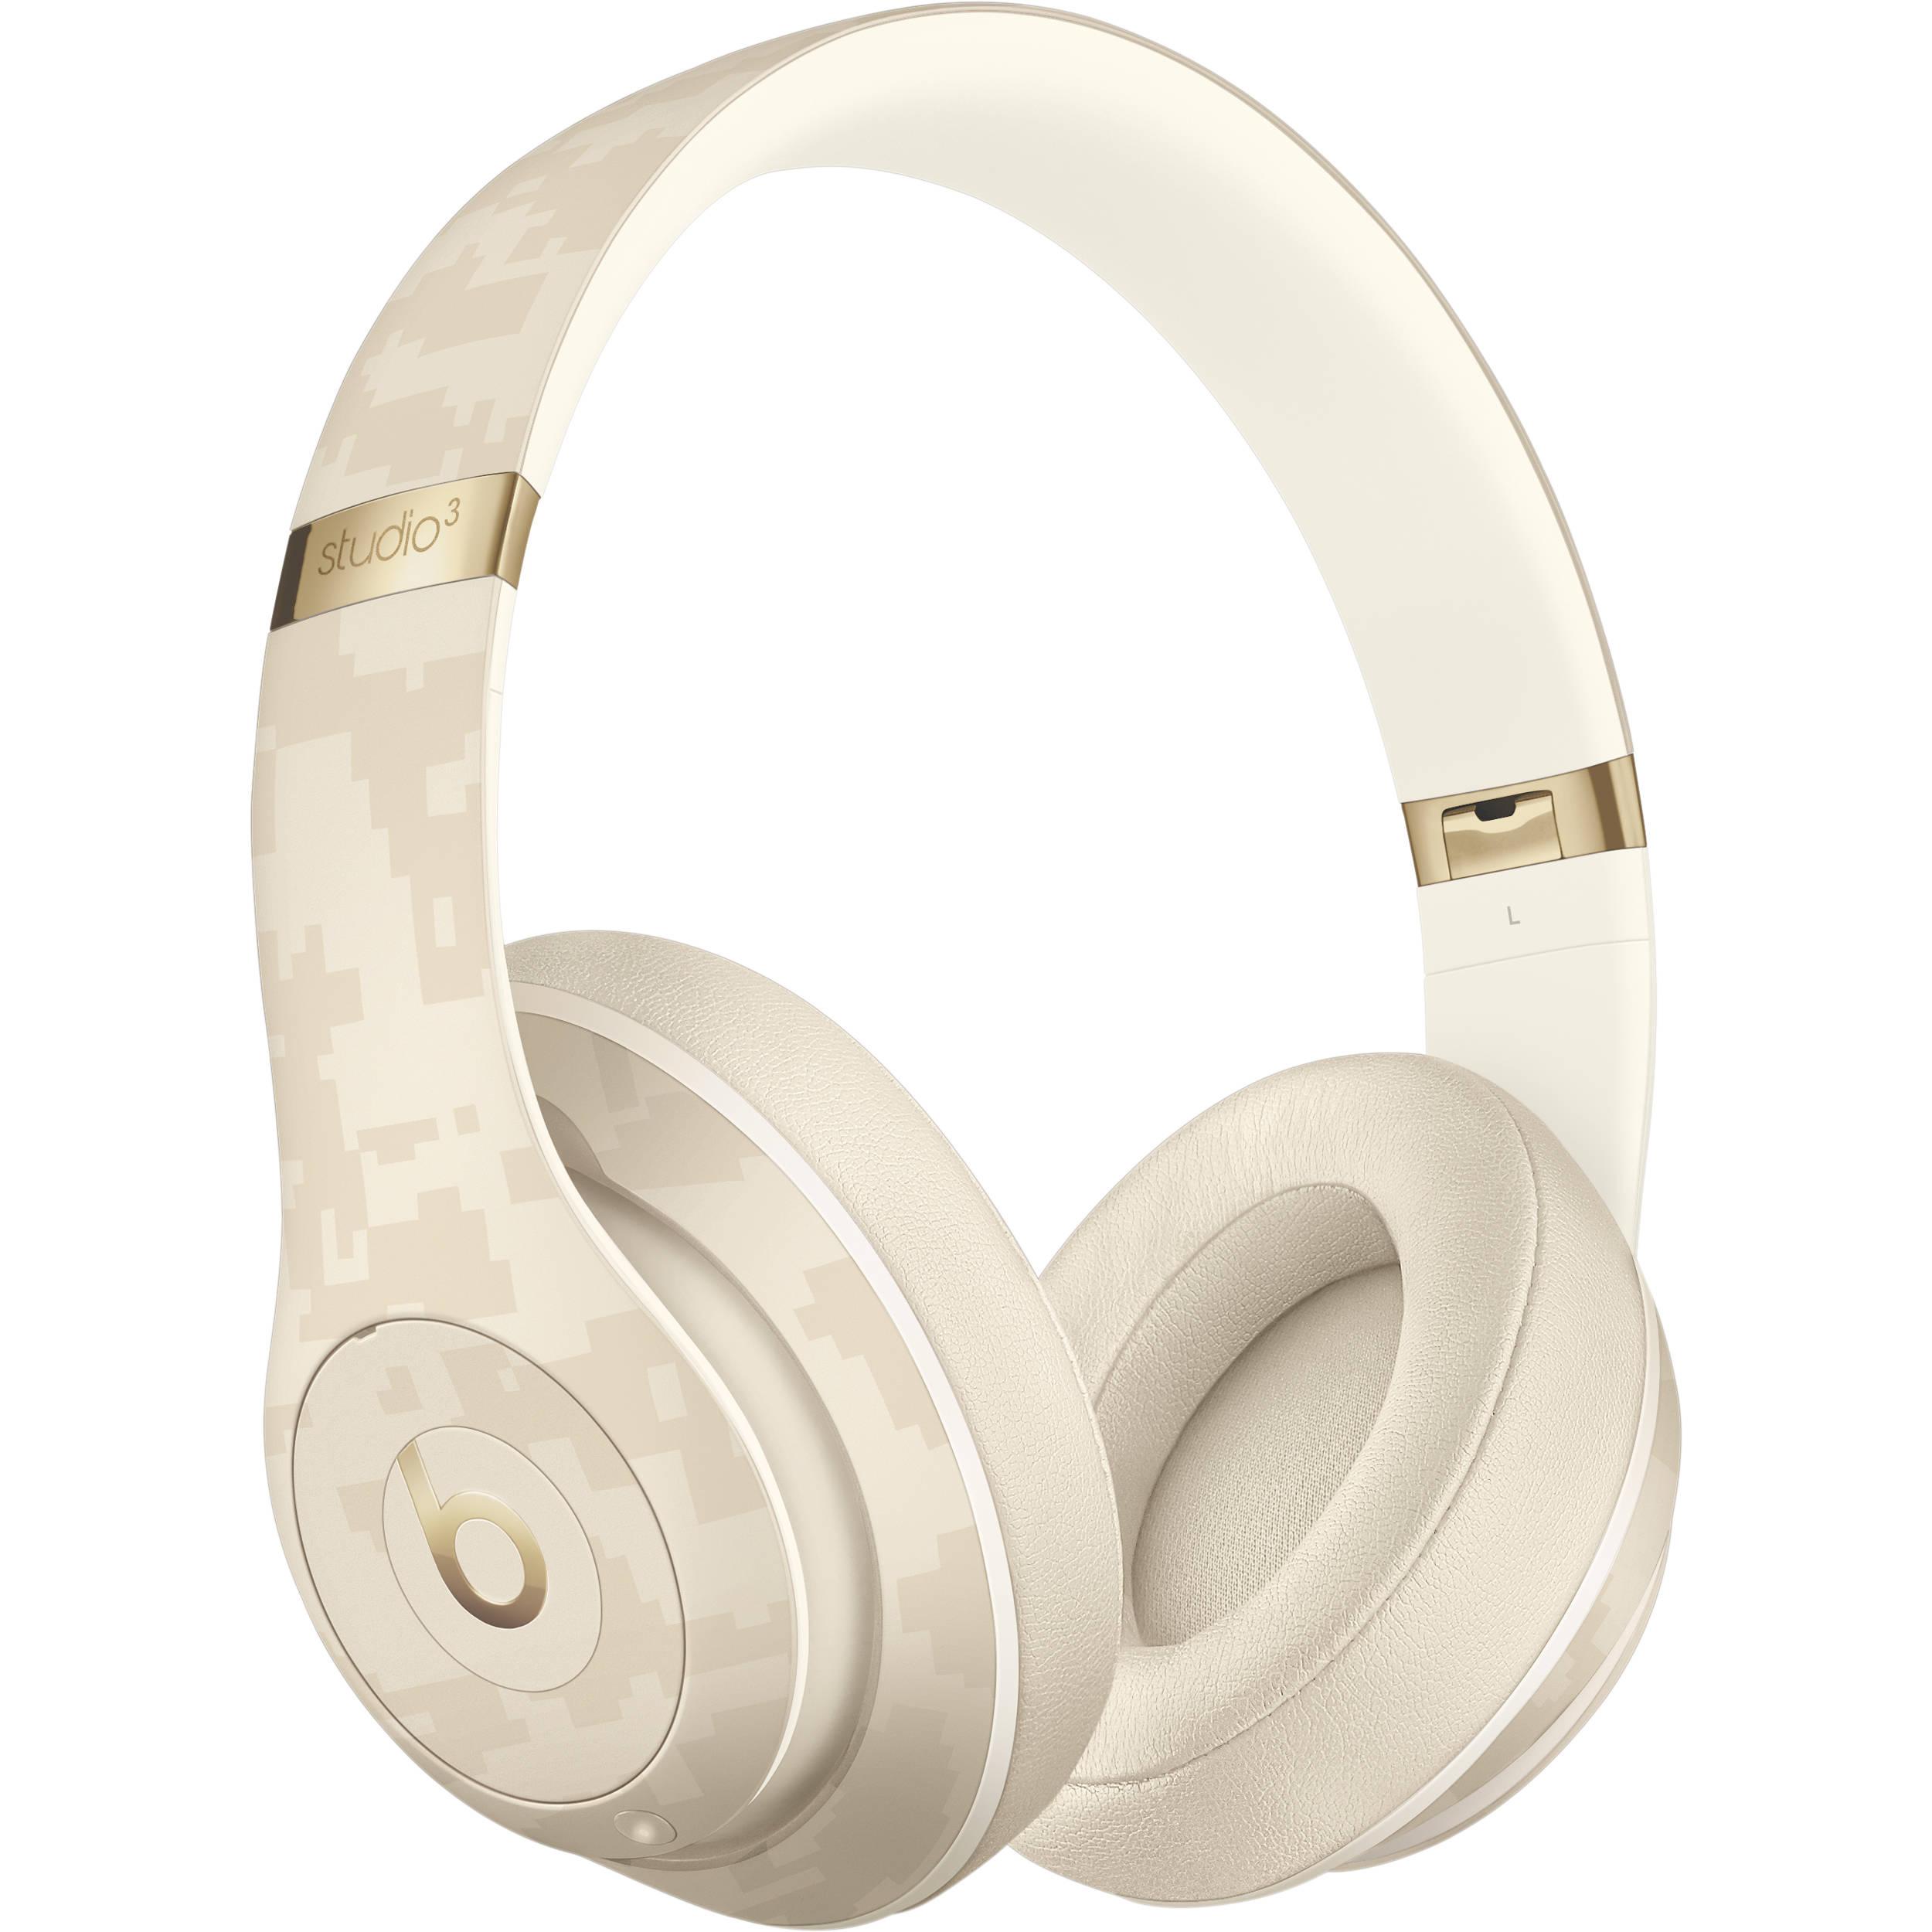 Beats By Dr Dre Studio3 Wireless Bluetooth Headphones Mwuj2lla